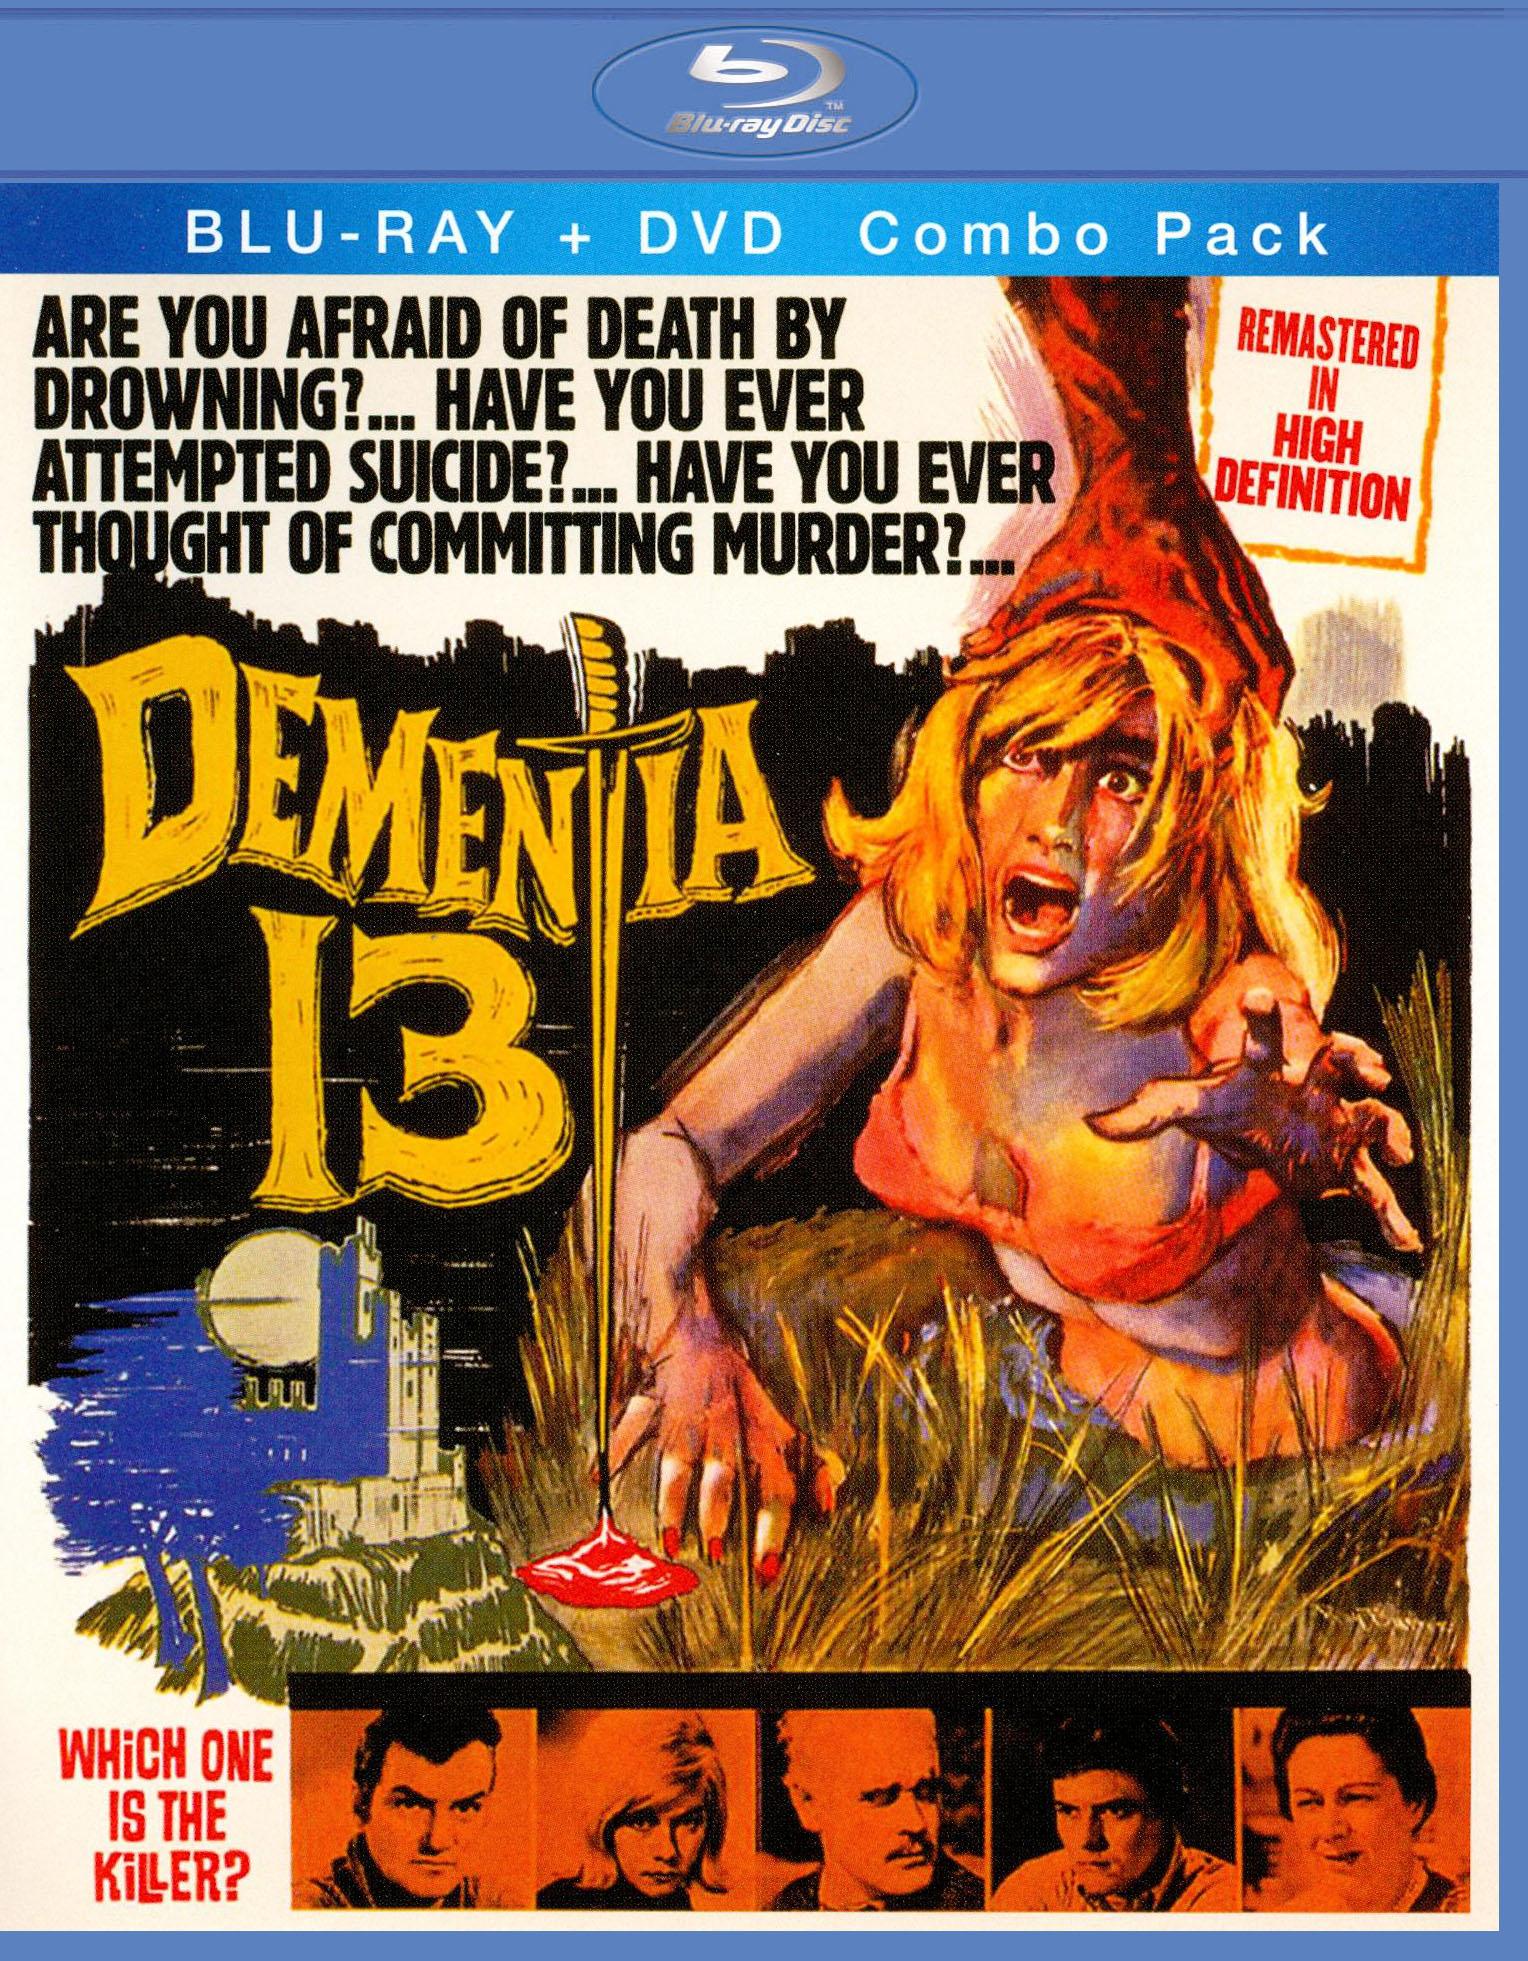 Dementia 13 [2 Discs] [blu-ray/dvd] 19090302